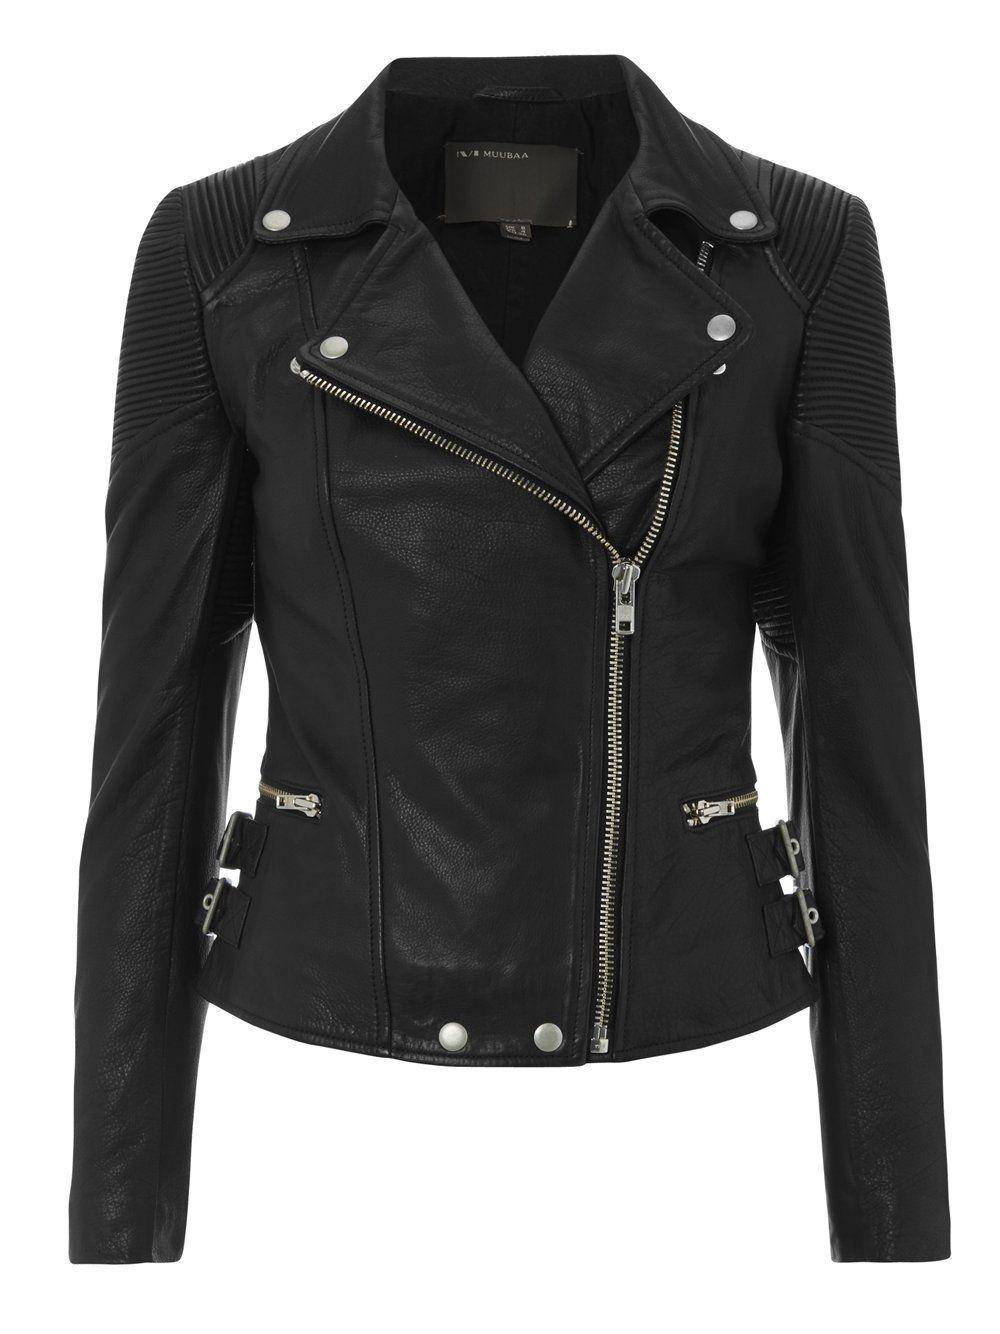 Horana Black Corded Leather Biker Muubaa leather jacket